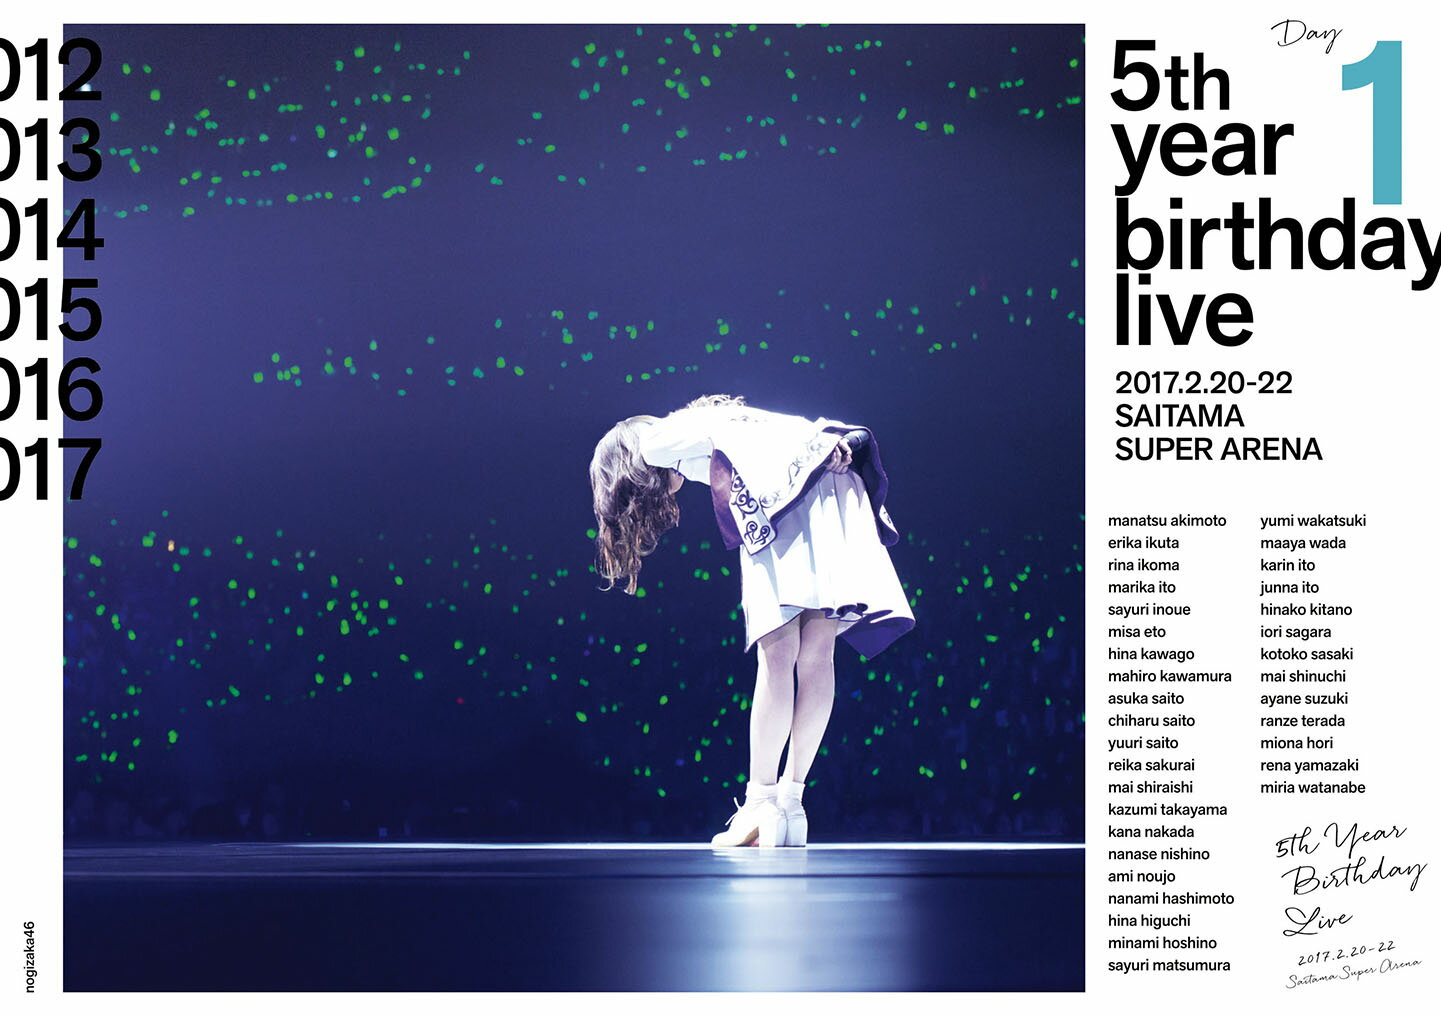 5th YEAR BIRTHDAY LIVE 2017.2.20-22 SAITAMA SUPER ARENA DAY1【Blu-ray】 [ 乃木坂46 ]